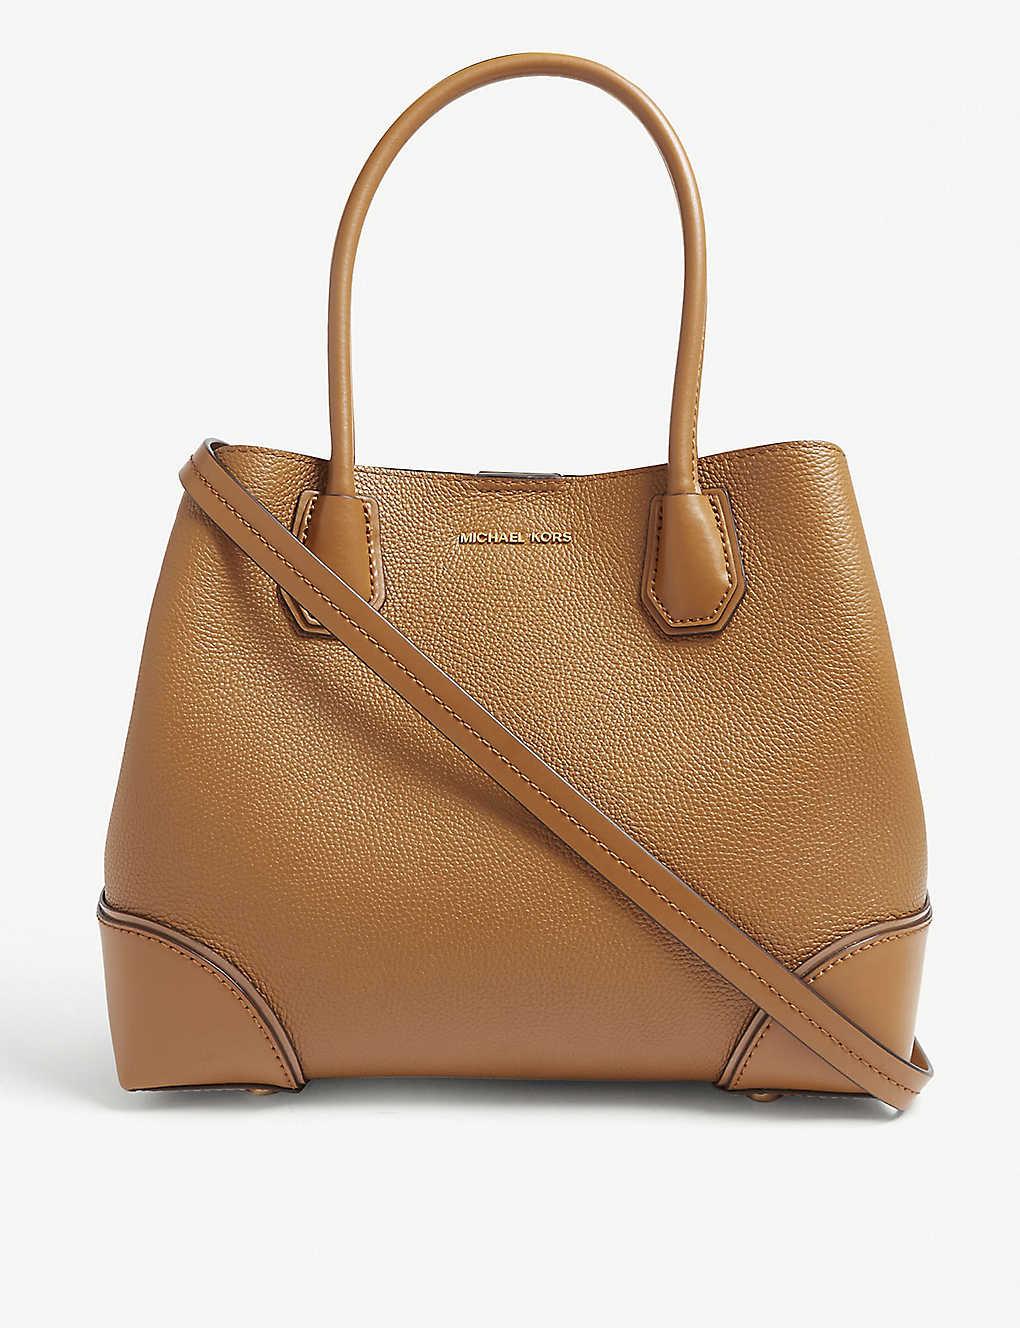 62e36476d67cd4 MICHAEL MICHAEL KORS - Mercer Gallery pebbled leather satchel ...